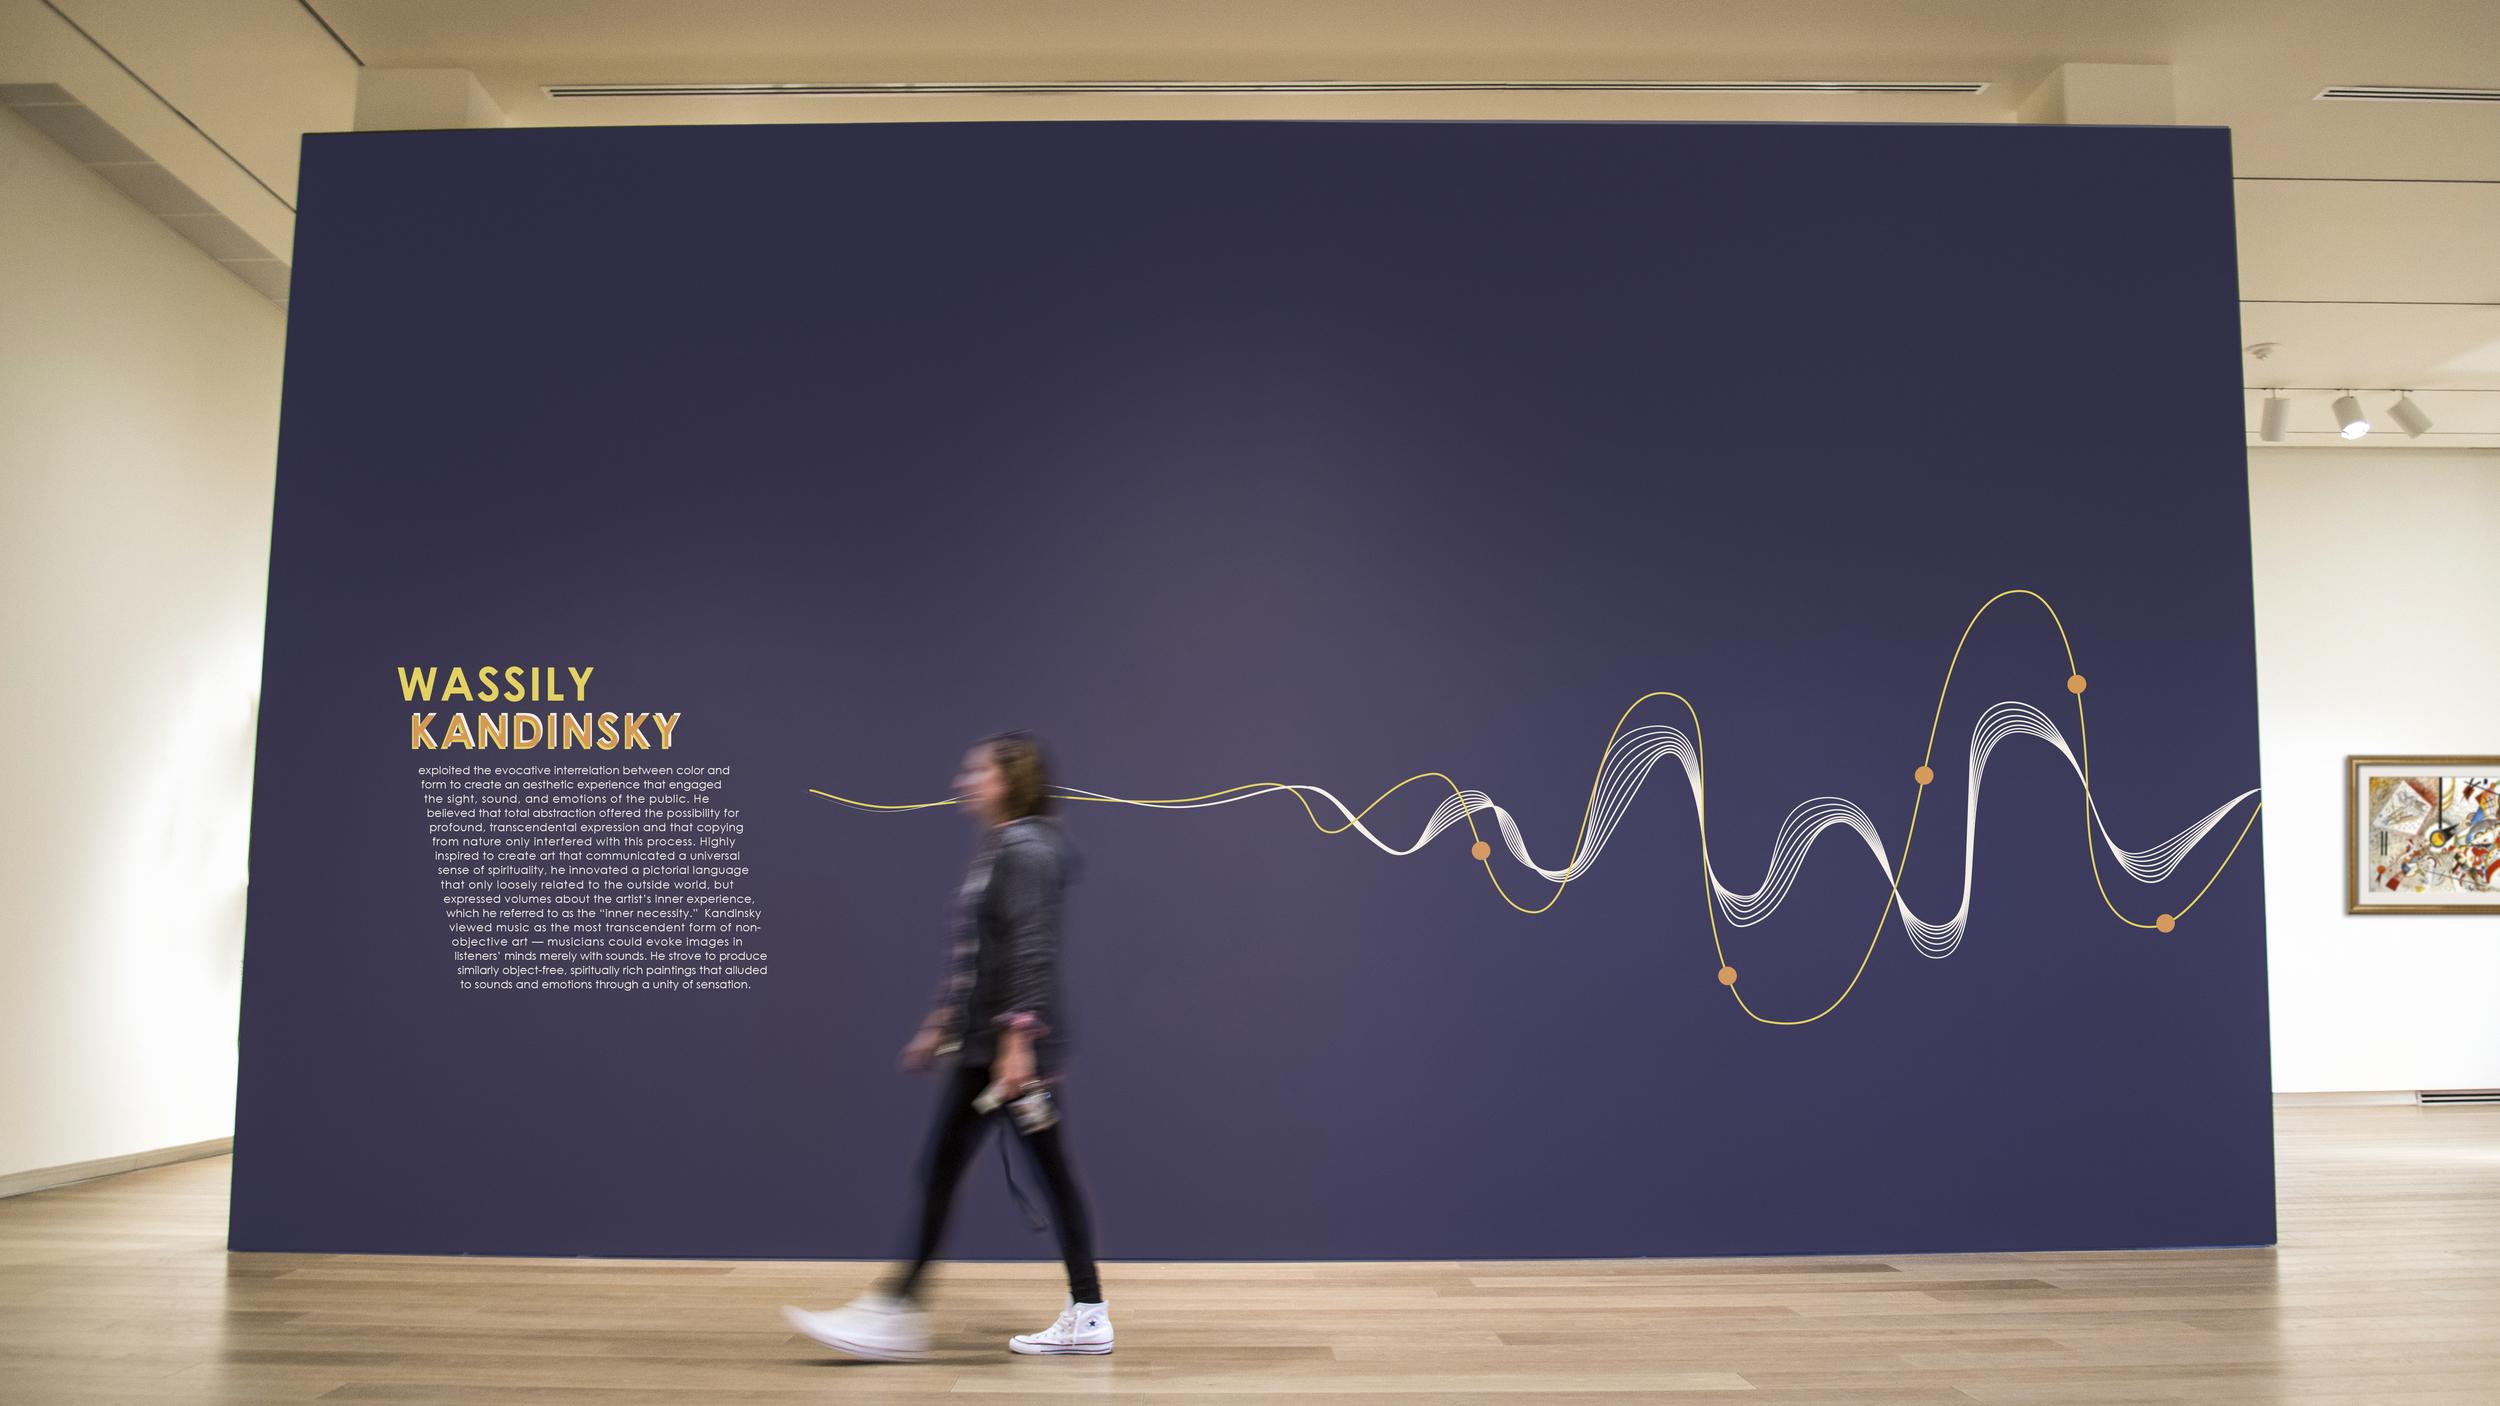 wall-text1.jpg